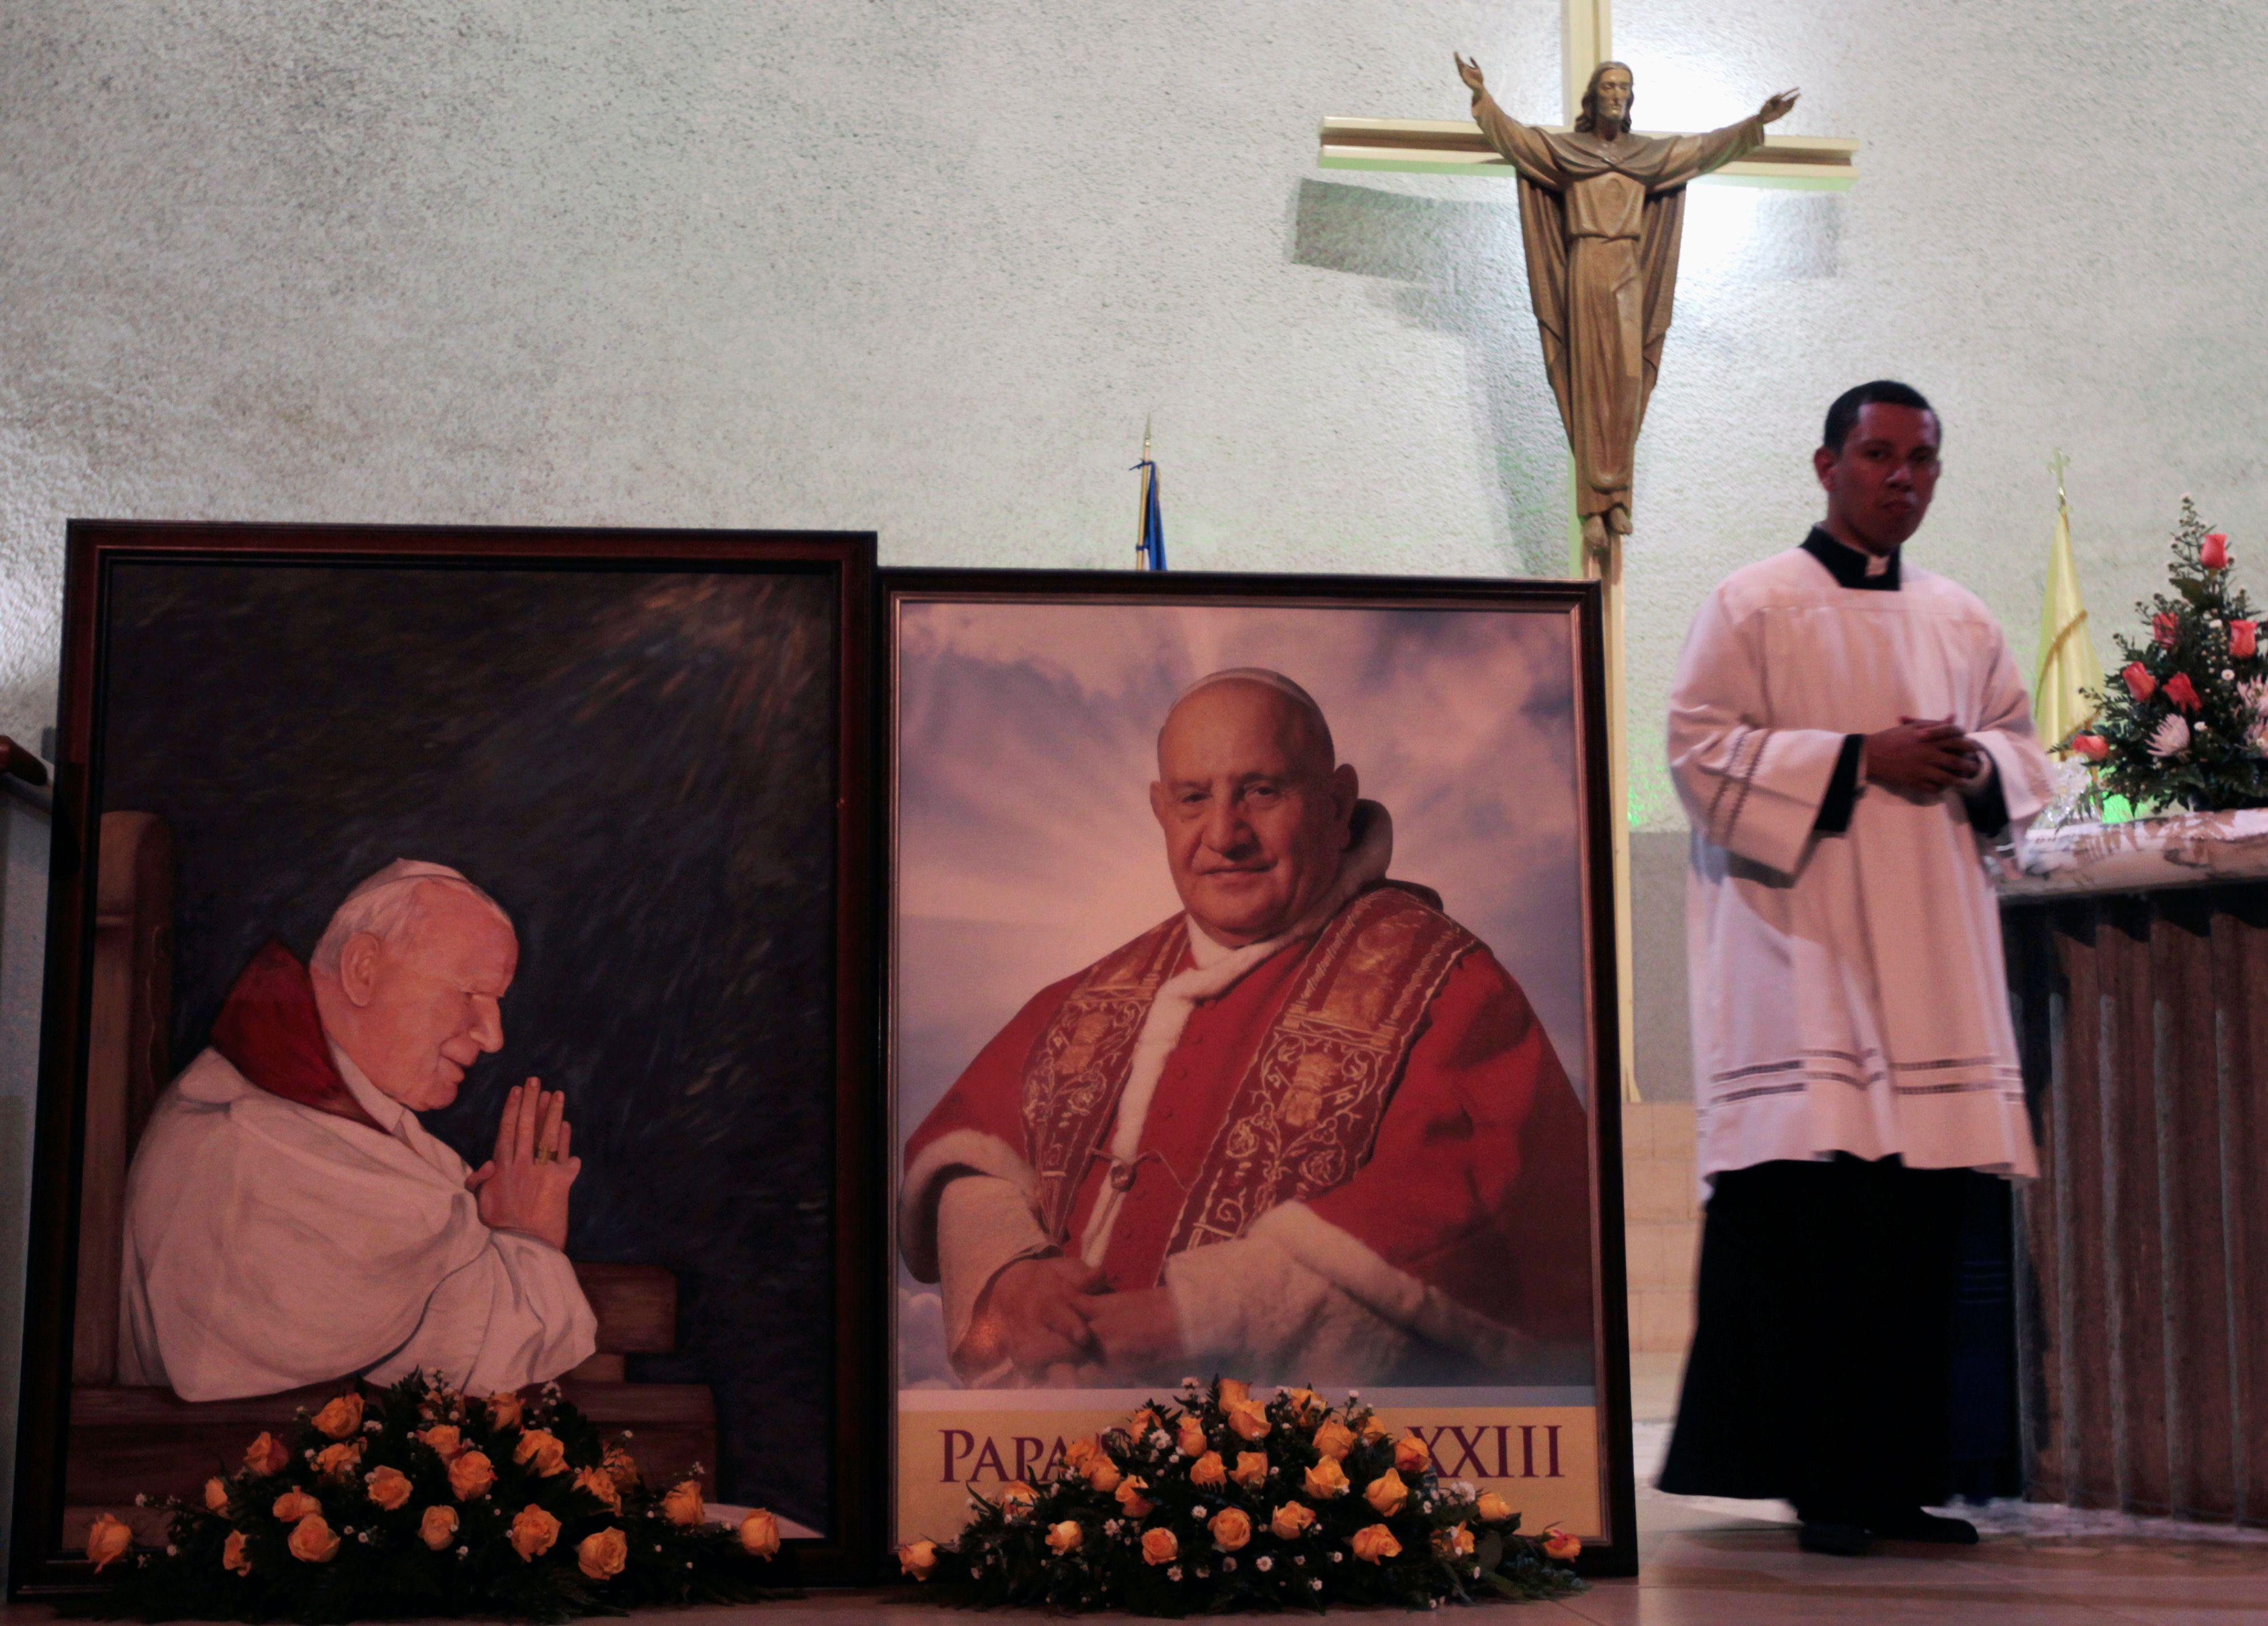 Des photos de Jean-Paul II et Jean XXIII, ce matin lors de la double-canonisation.